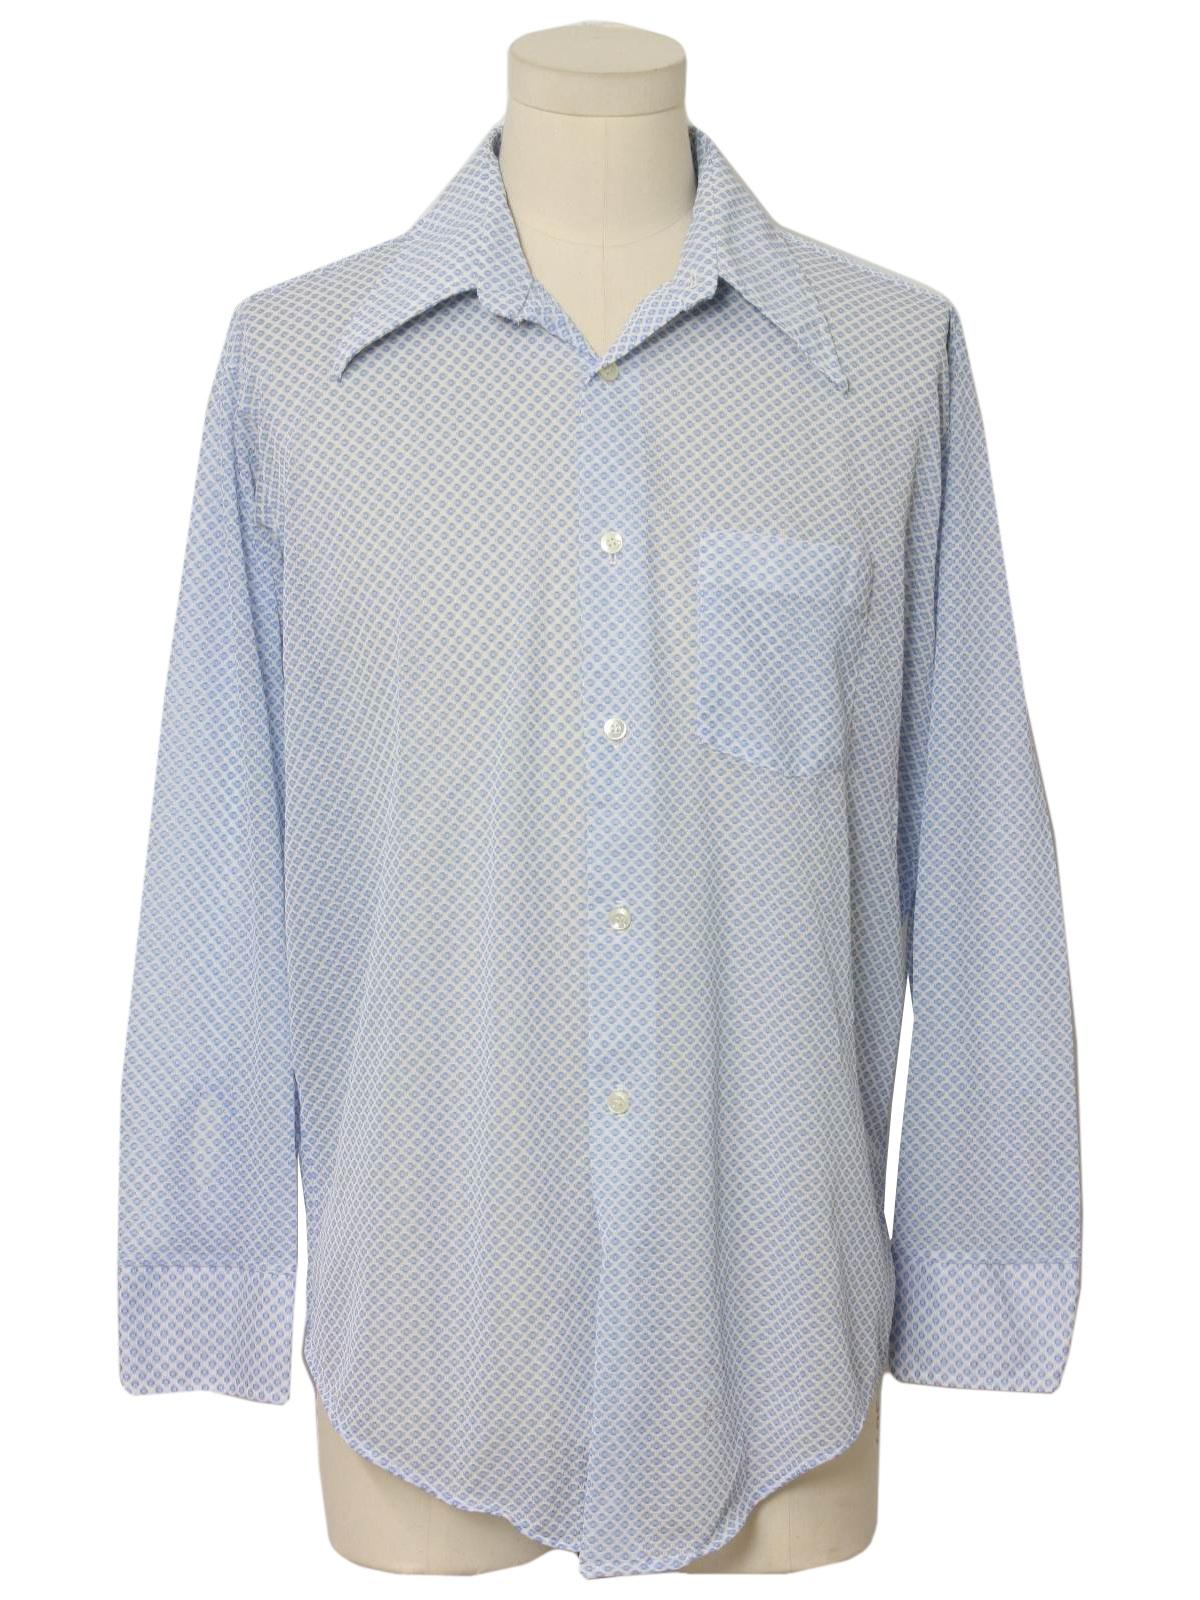 Vintage kmart 70 39 s print disco shirt 70s kmart mens for Kmart button up shirts